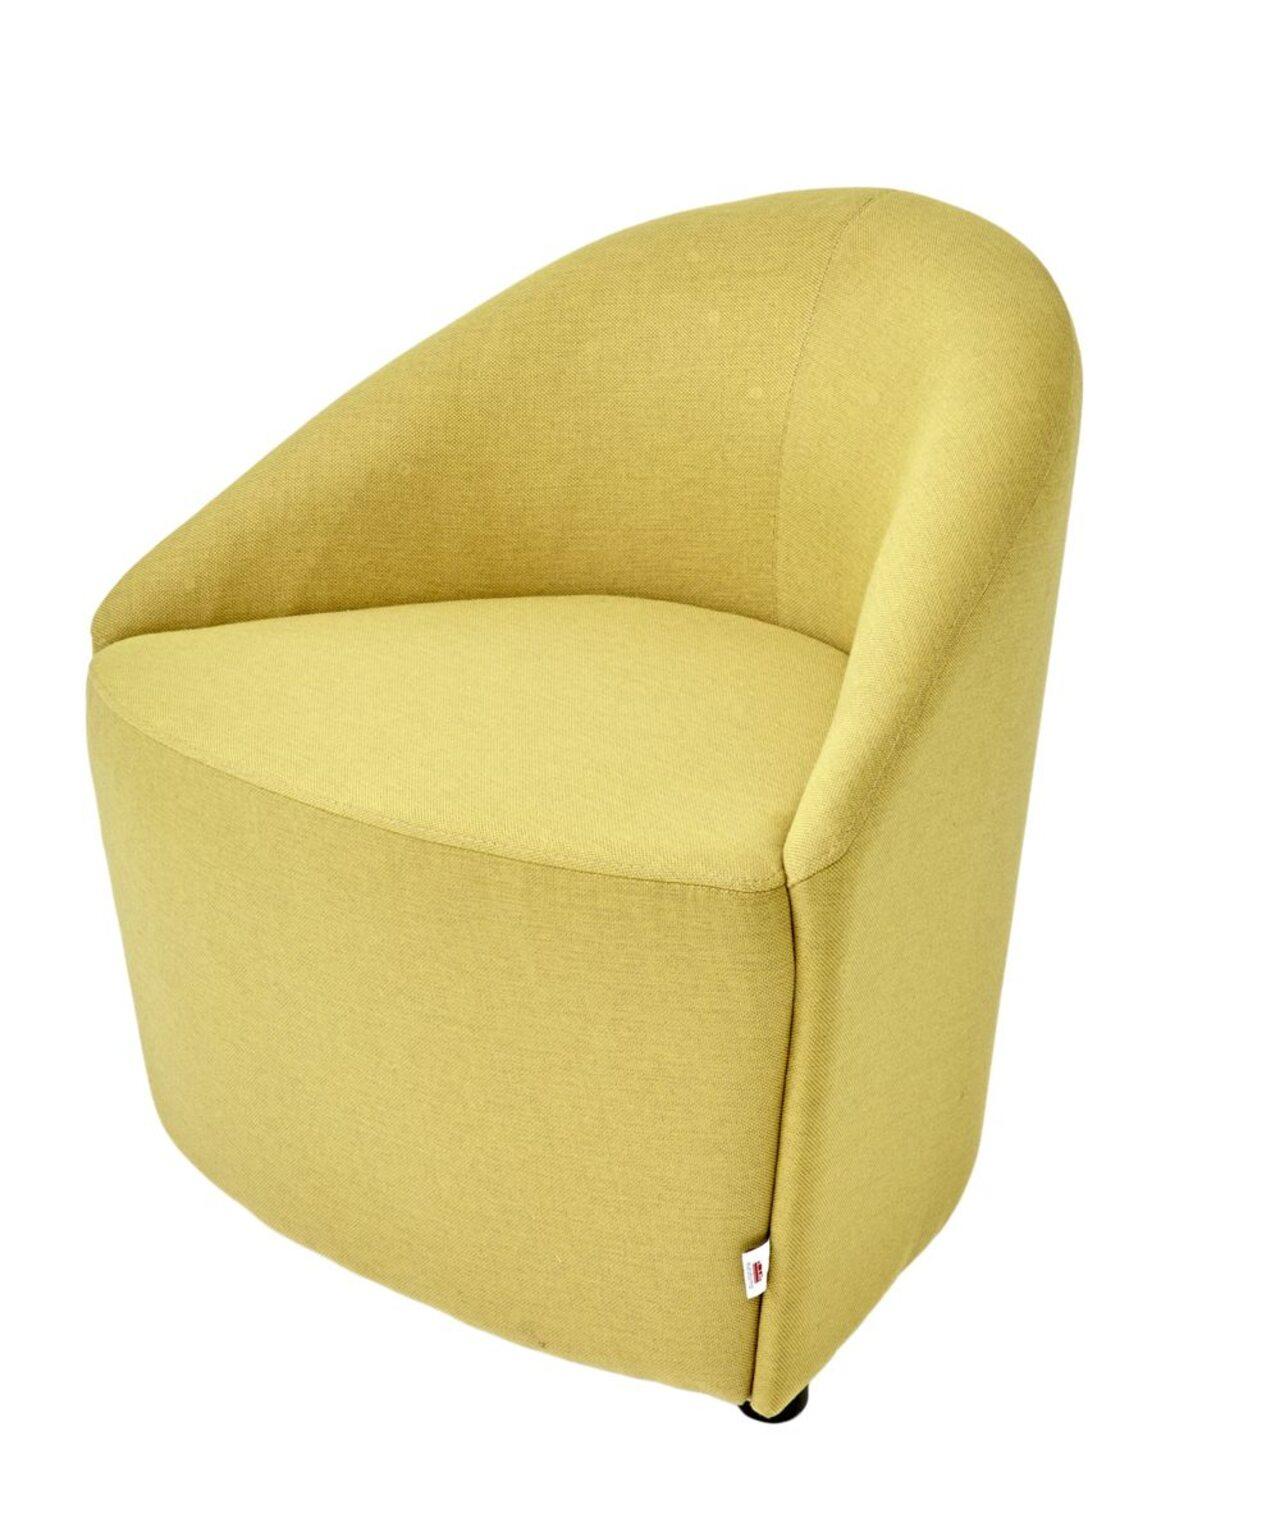 Кресло стационарное  3D 79x65x71 - фото 7